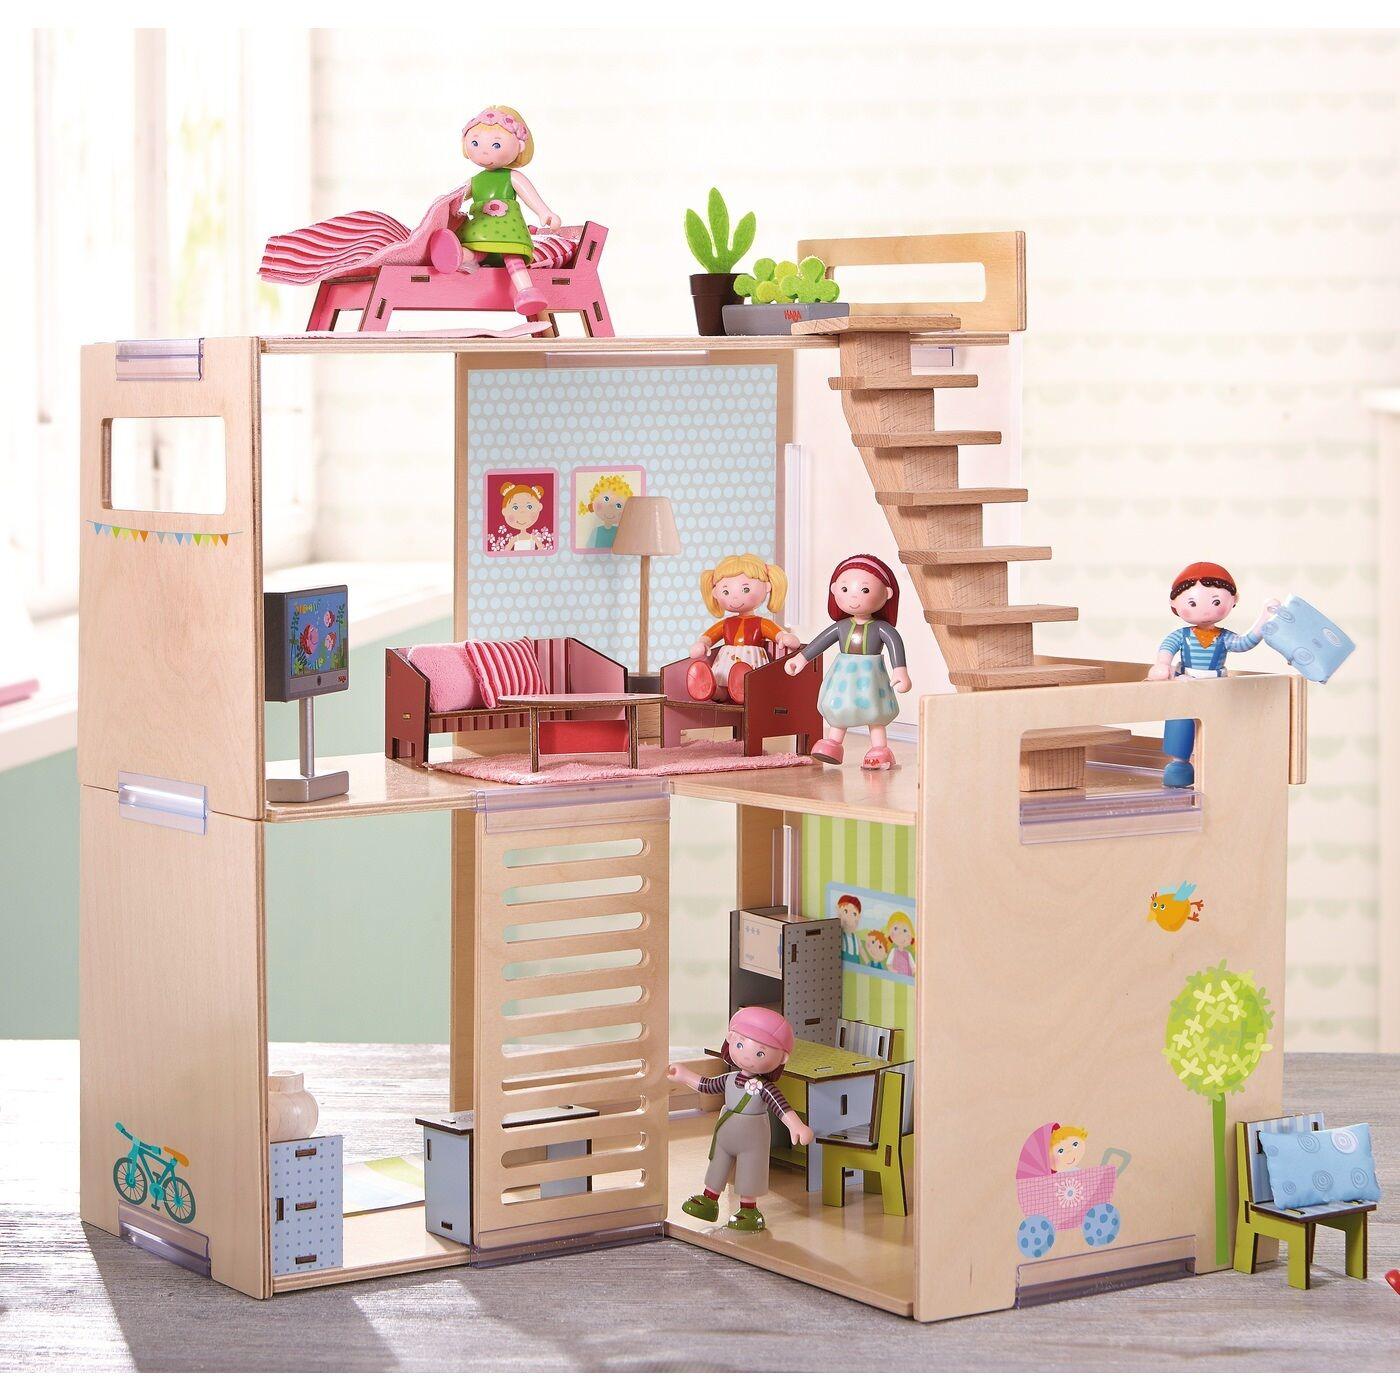 HABA Puppenhaus Villa Frühlingsmorgen 301781 Ab 3 Jahre aus aus aus Holz + BONUS b15700